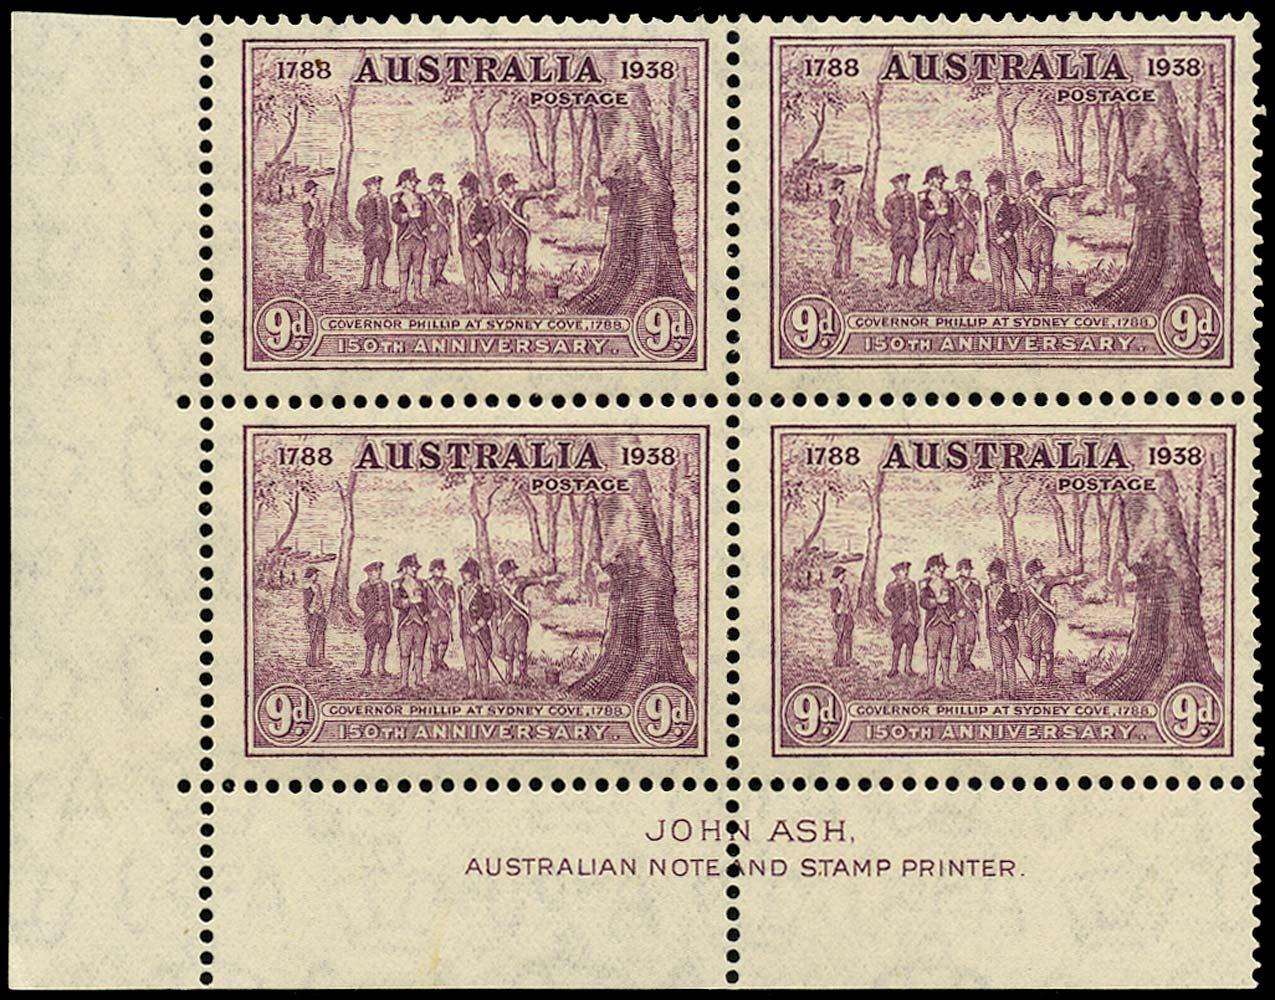 AUSTRALIA 1937  SG195 Mint New South Wales 150th Anniversary 9d purple